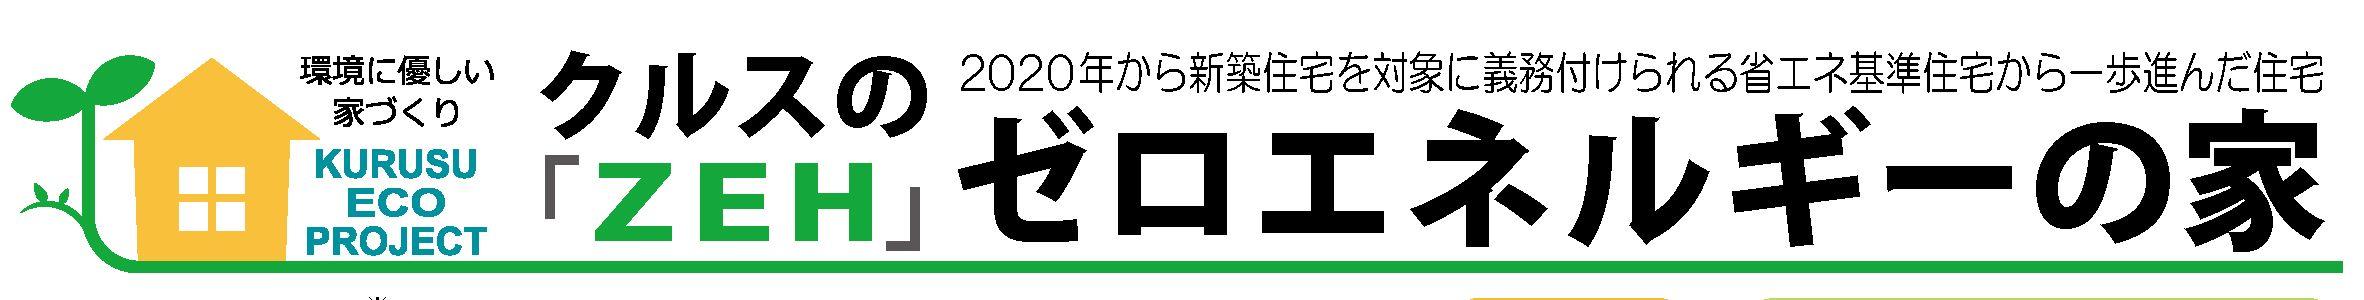 KuraSi-natu-sin103-02.jpg